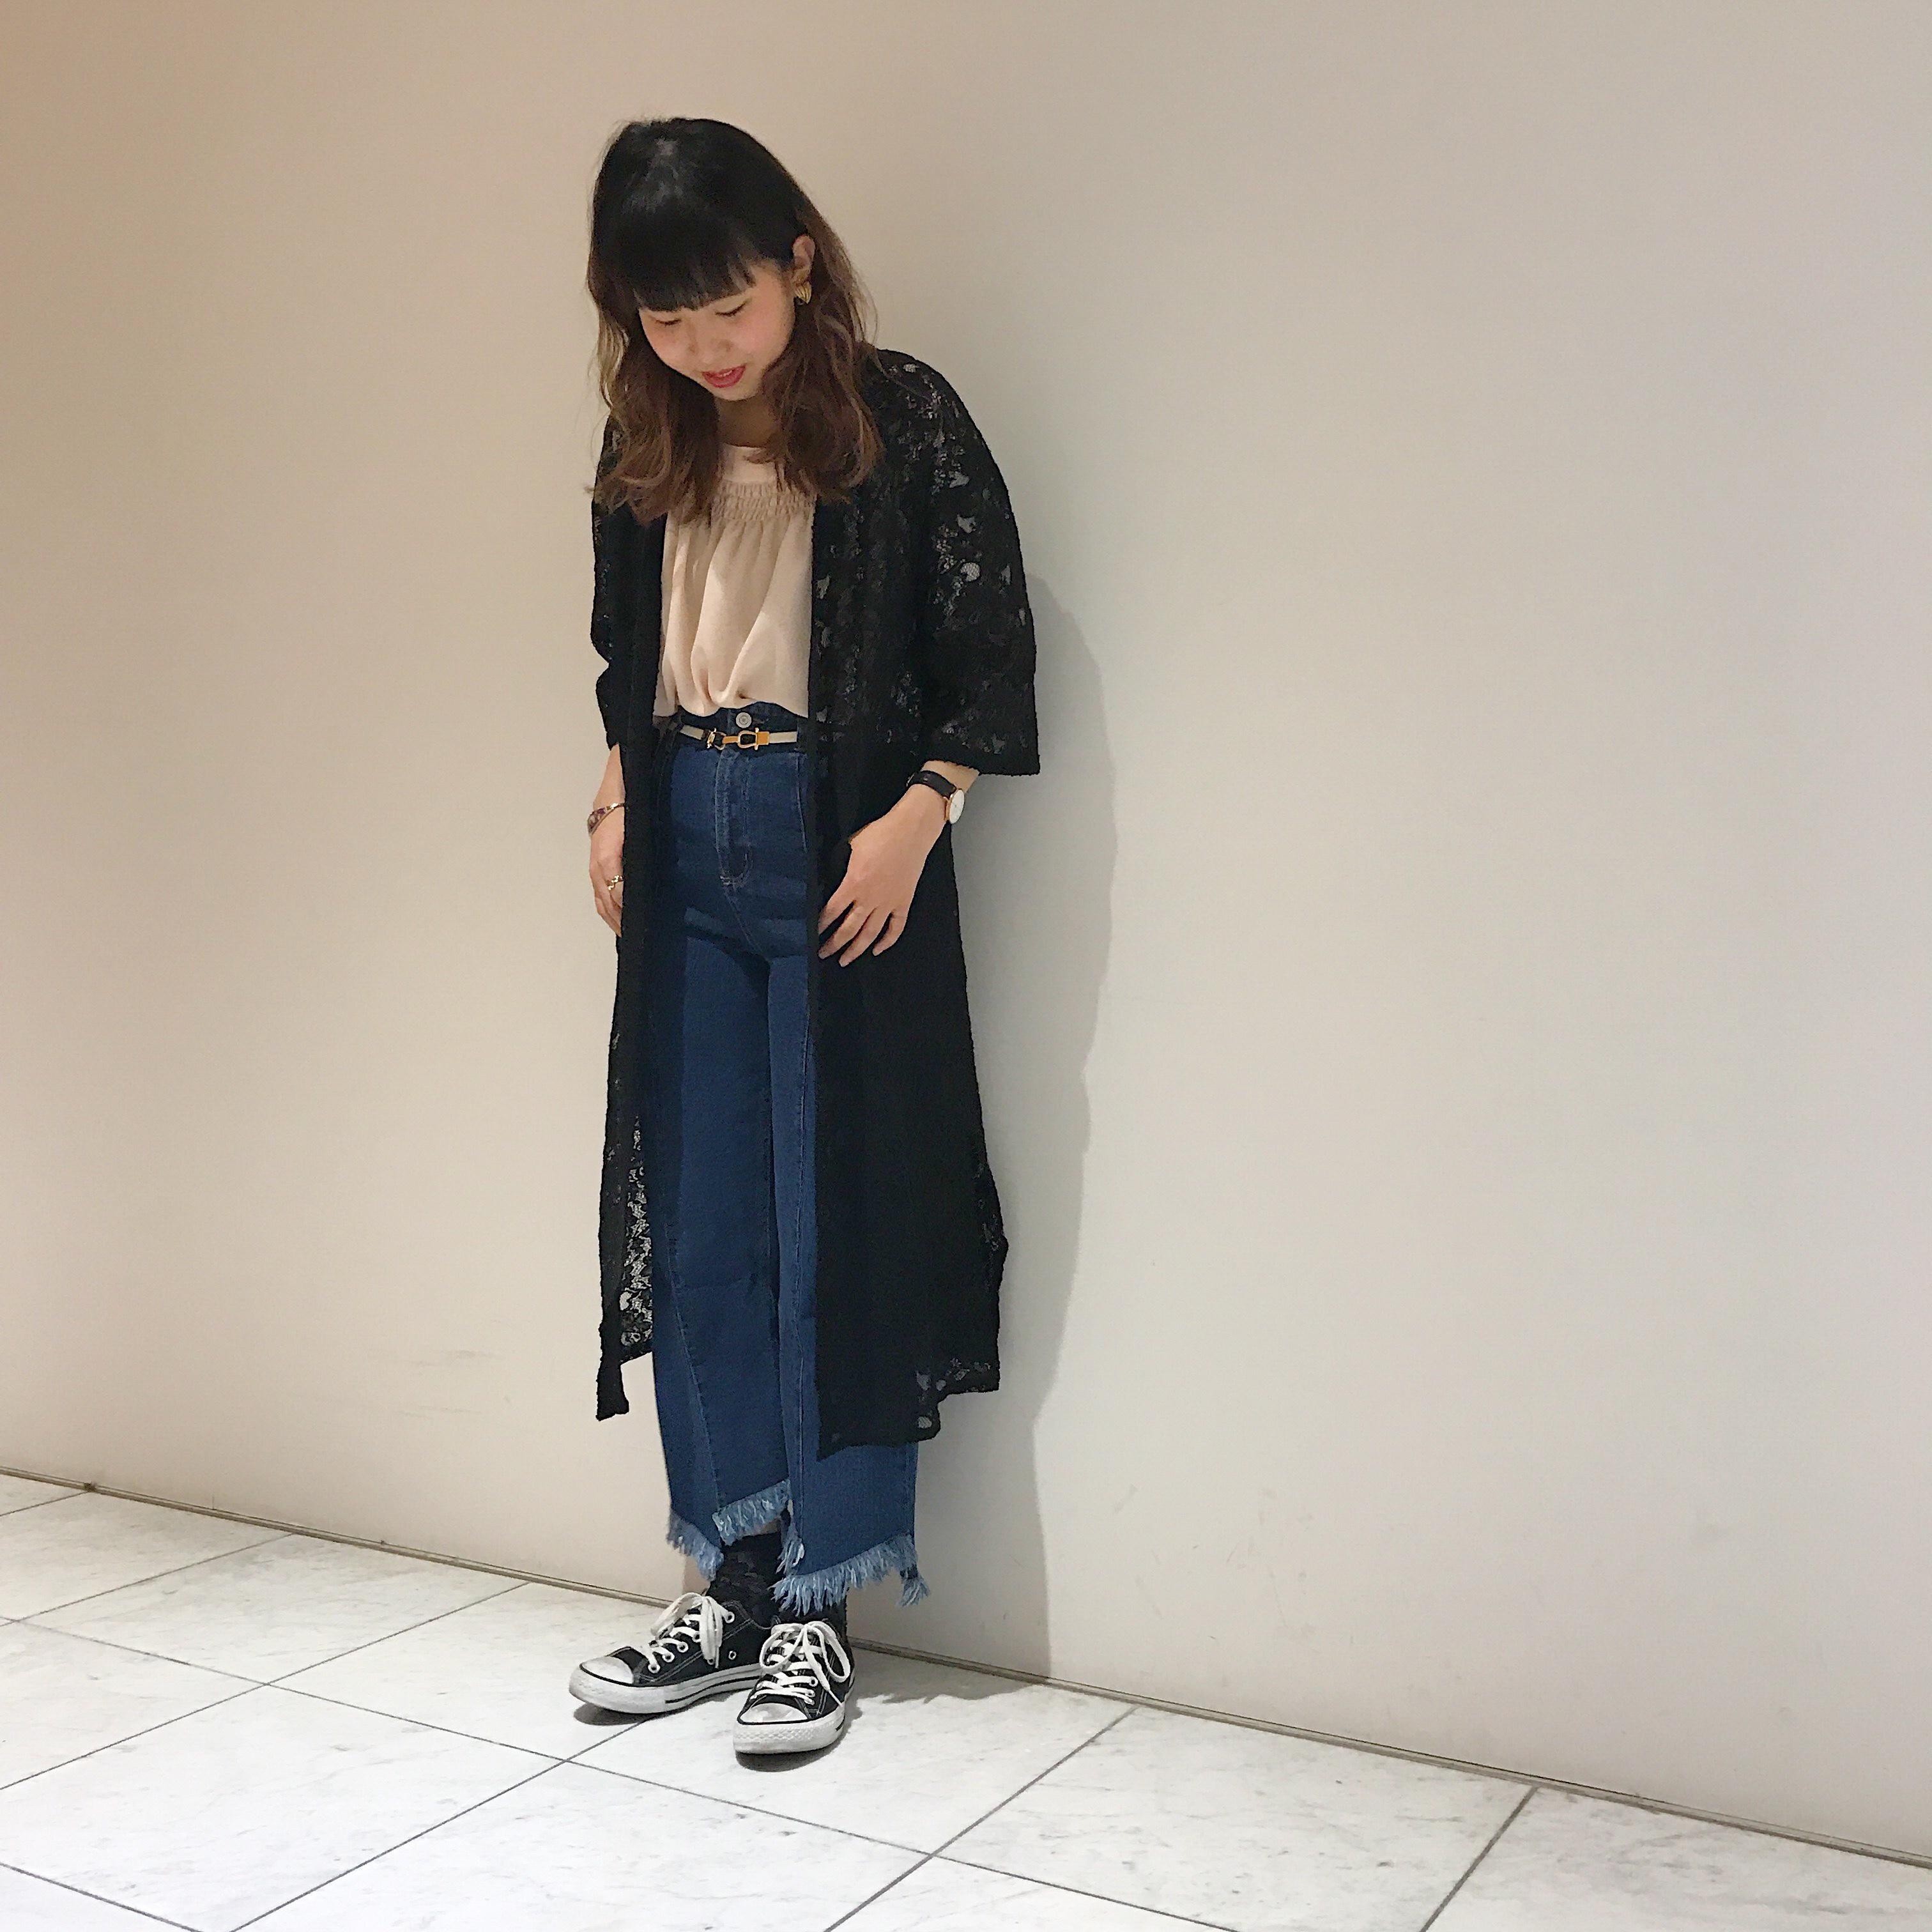 fc2blog_2017031615241203b.jpg